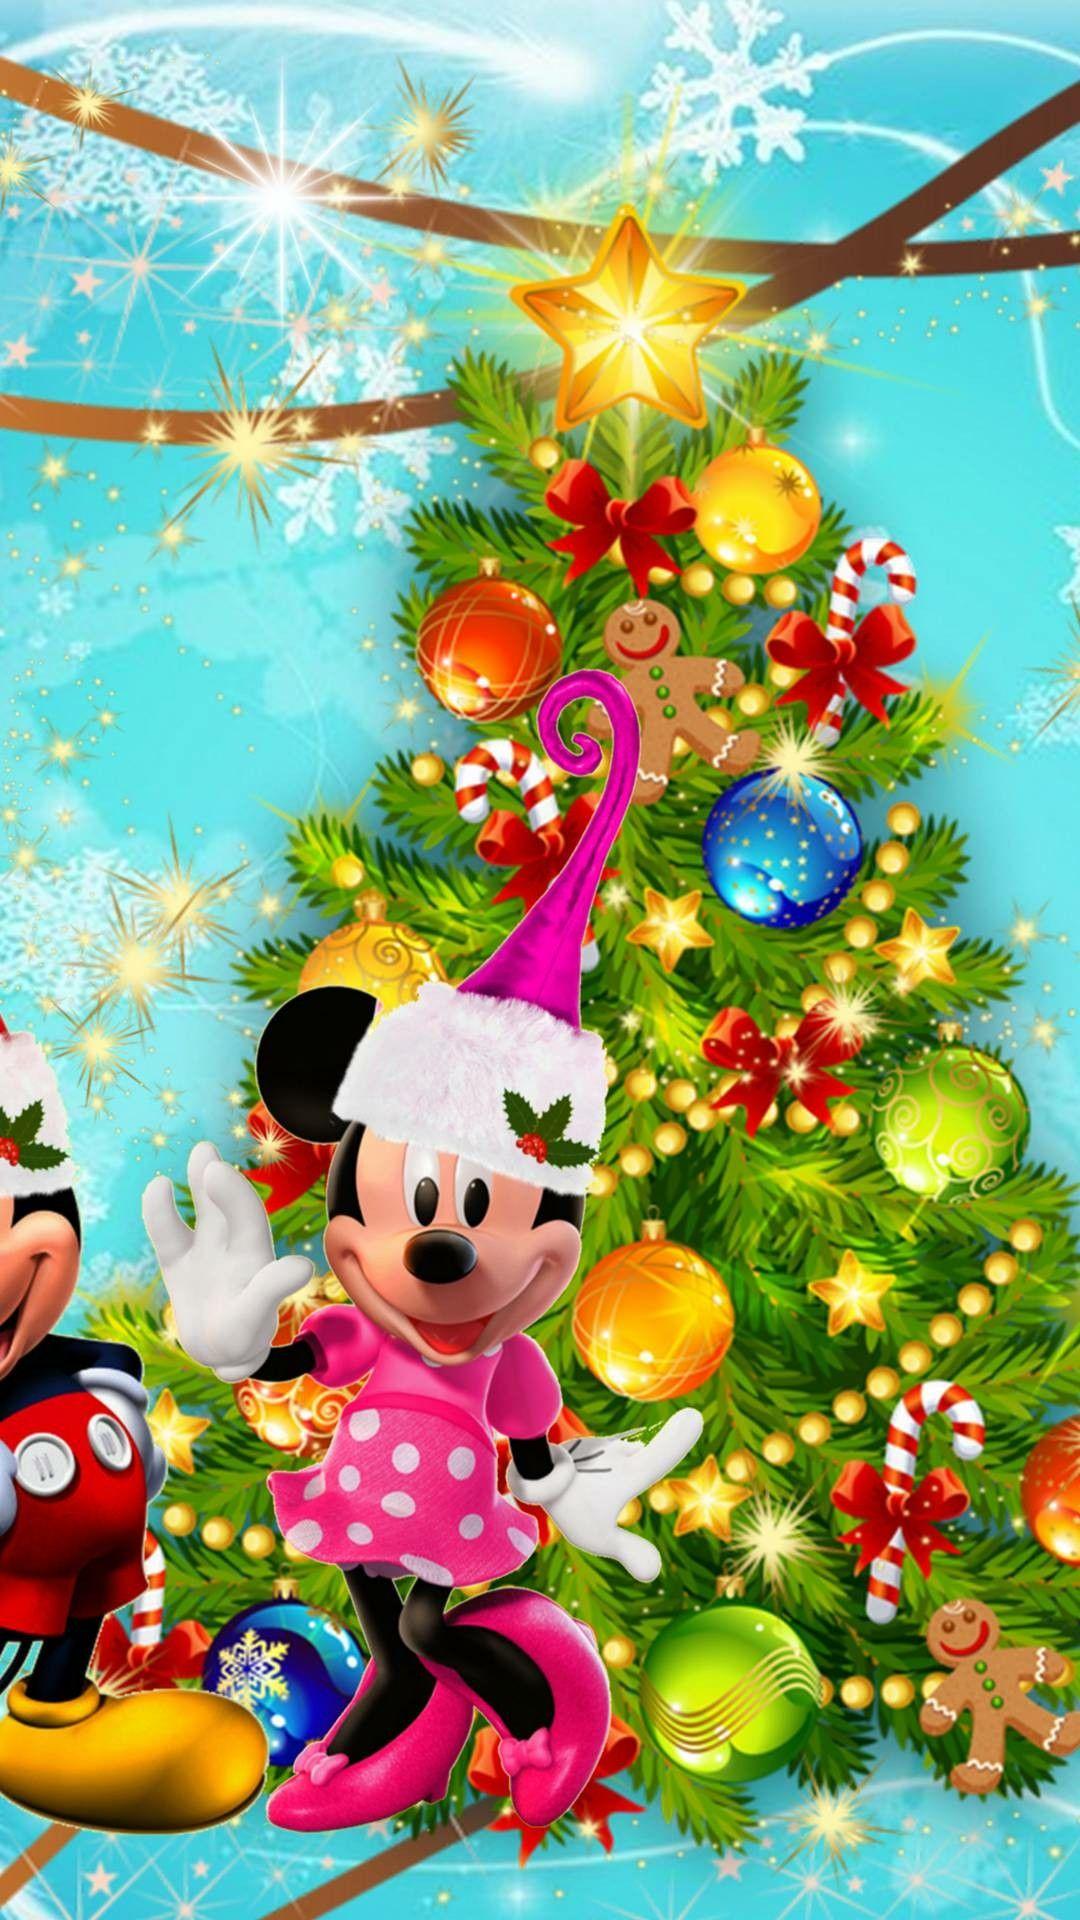 Minnie mouse Christmas Minnie mouse christmas, Christmas